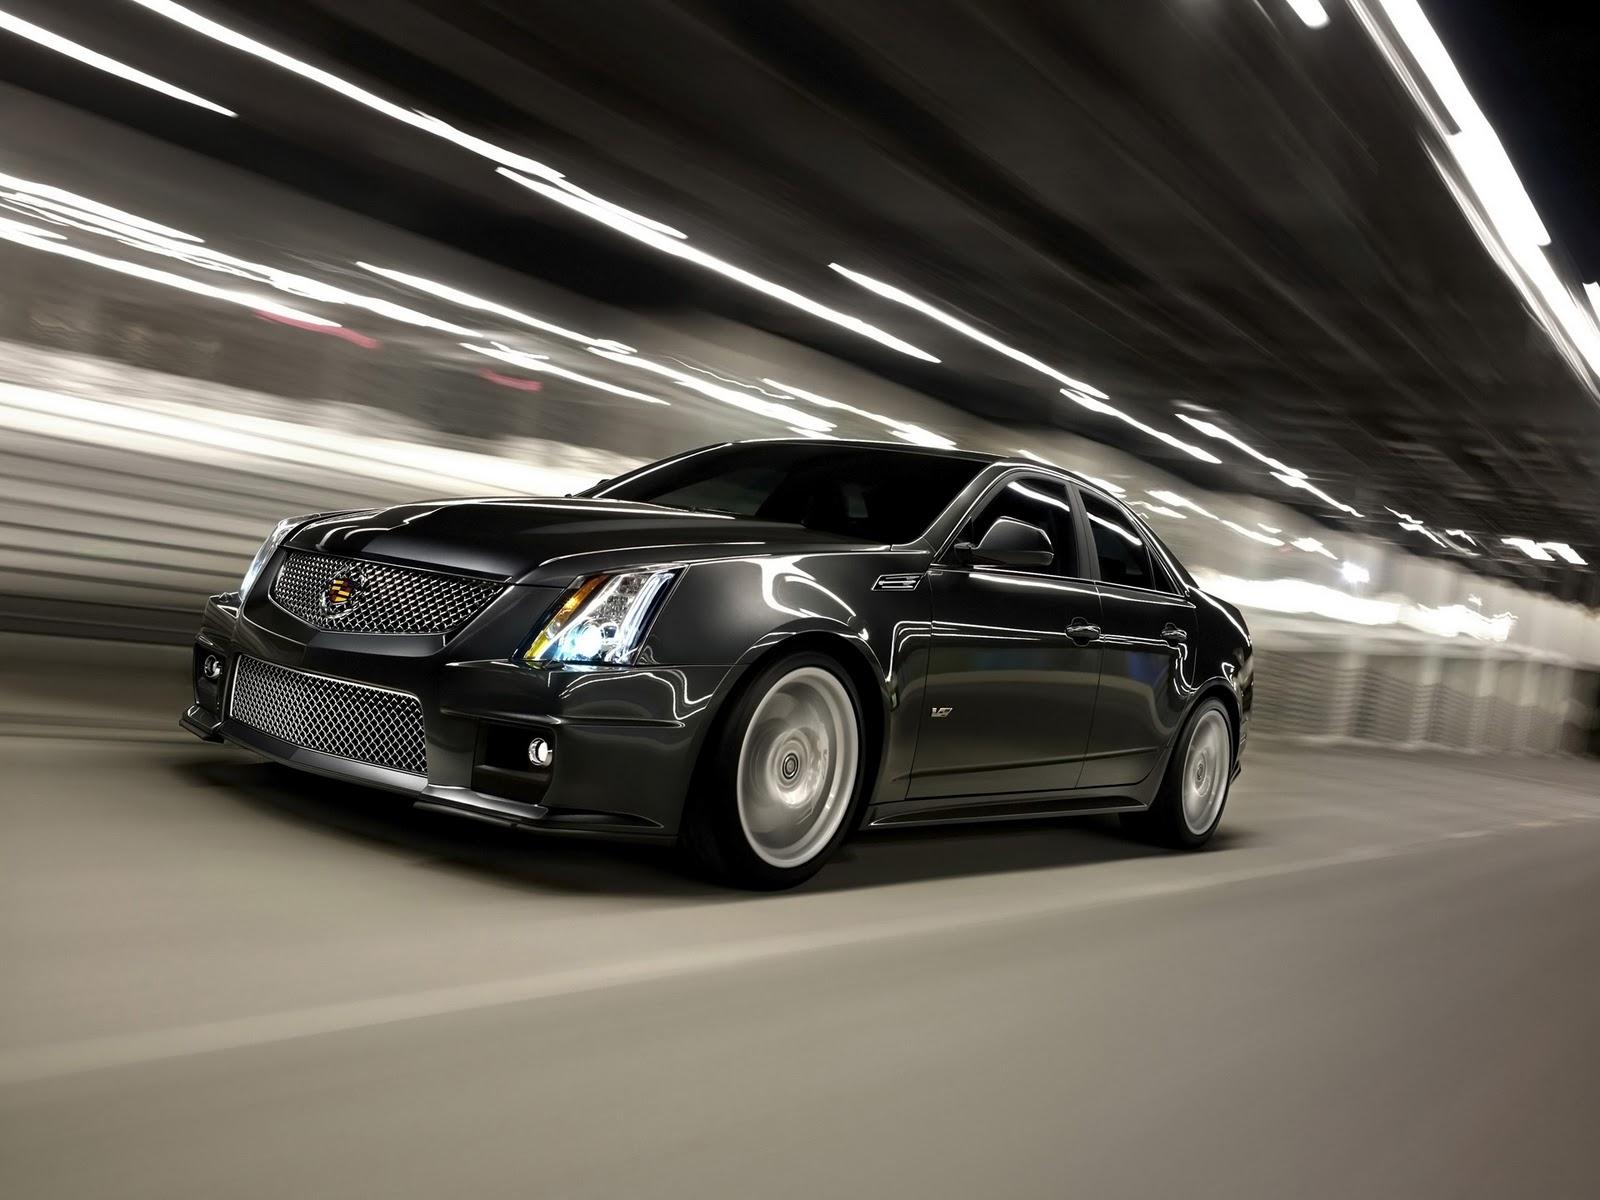 cars hd wallpapers 2011 cadillac cts v sport sedan. Black Bedroom Furniture Sets. Home Design Ideas